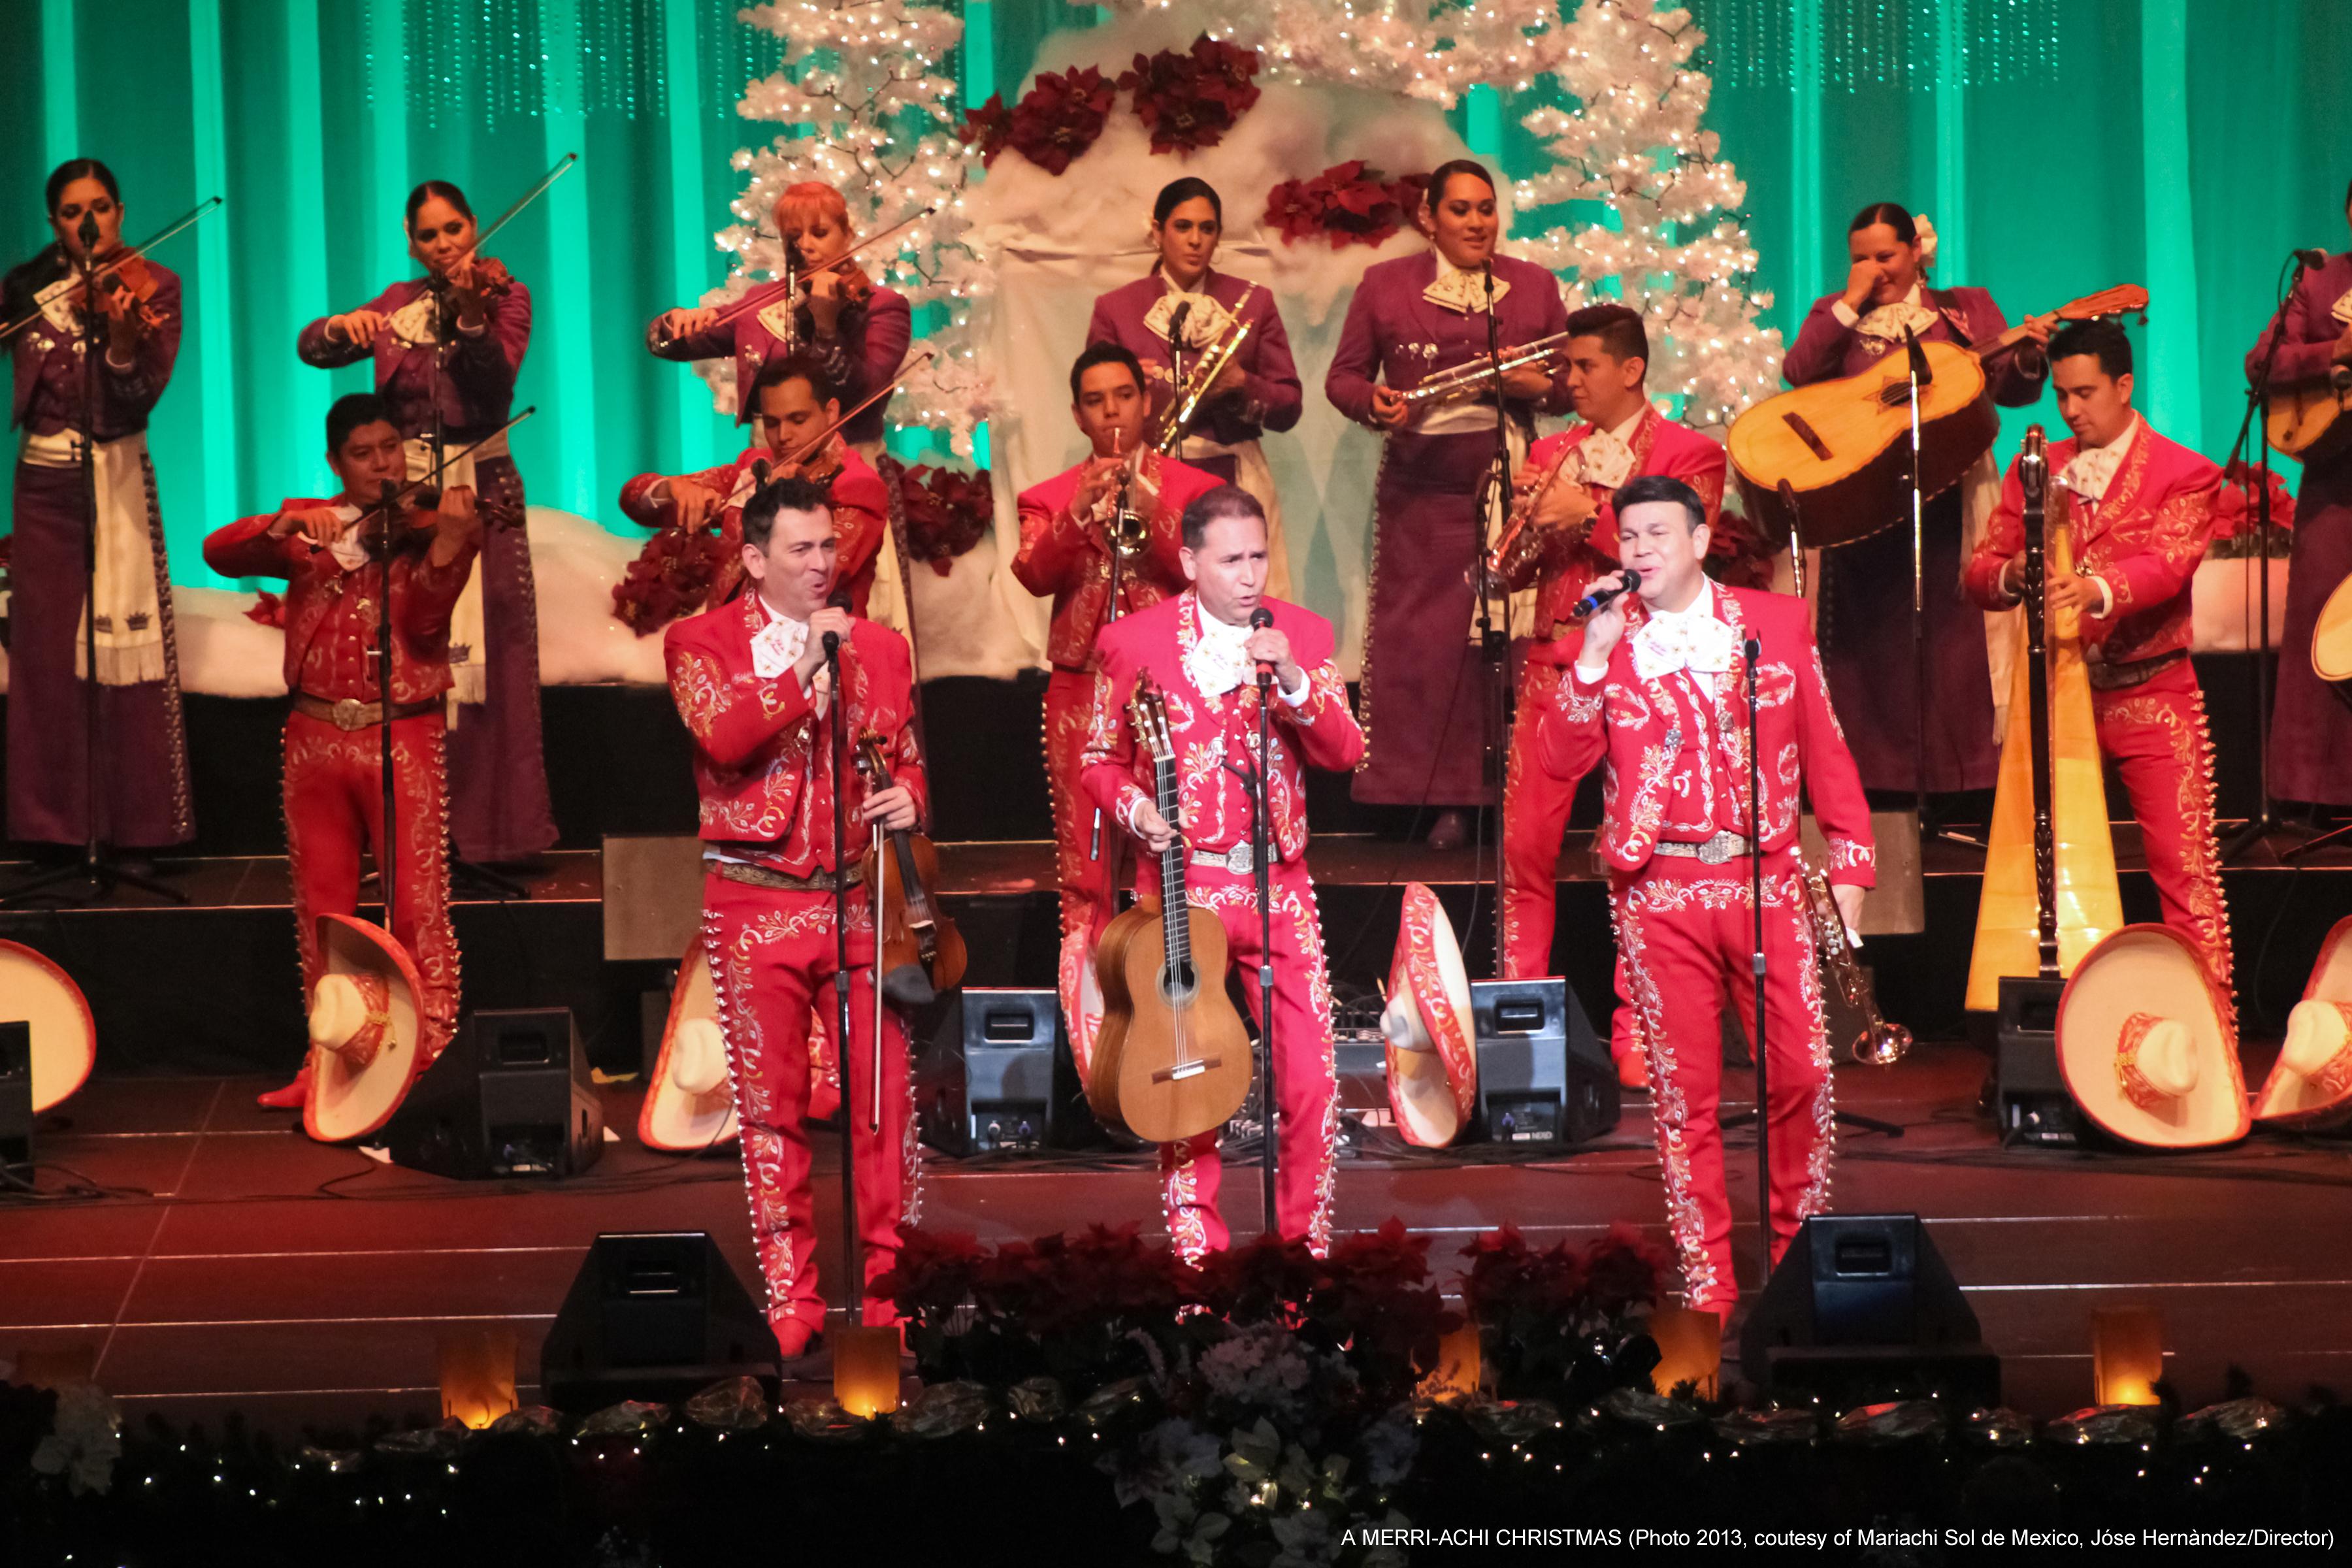 "Maricahi Sol de Mexico ""A Merri-Achi Christmas"" - Publicity Images"